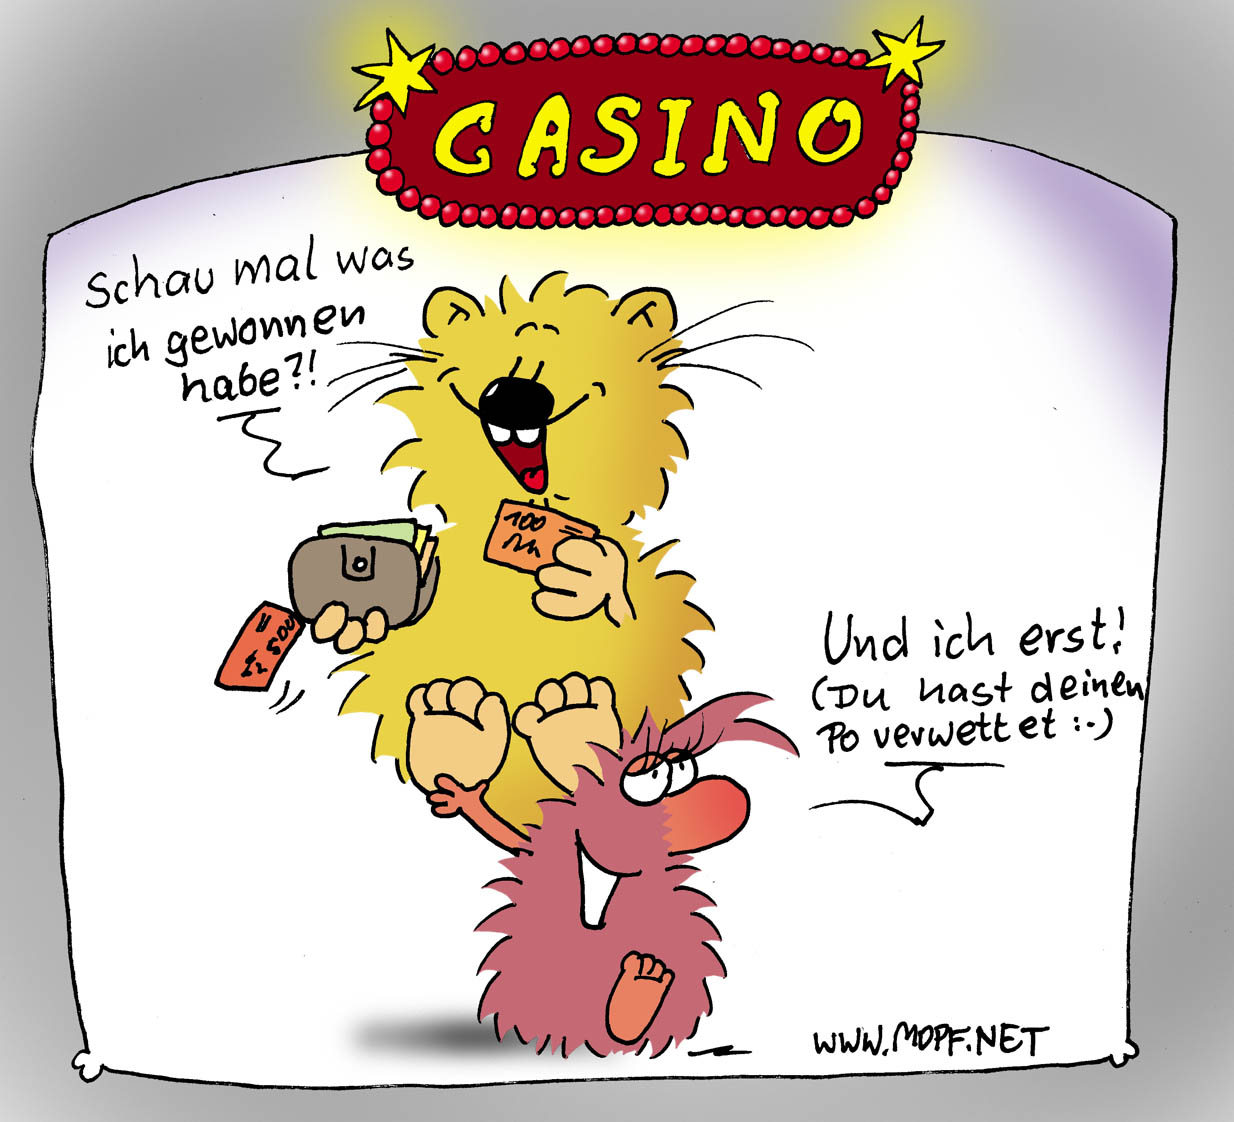 Geld im online casino gewinnen casino blackjack playing tips